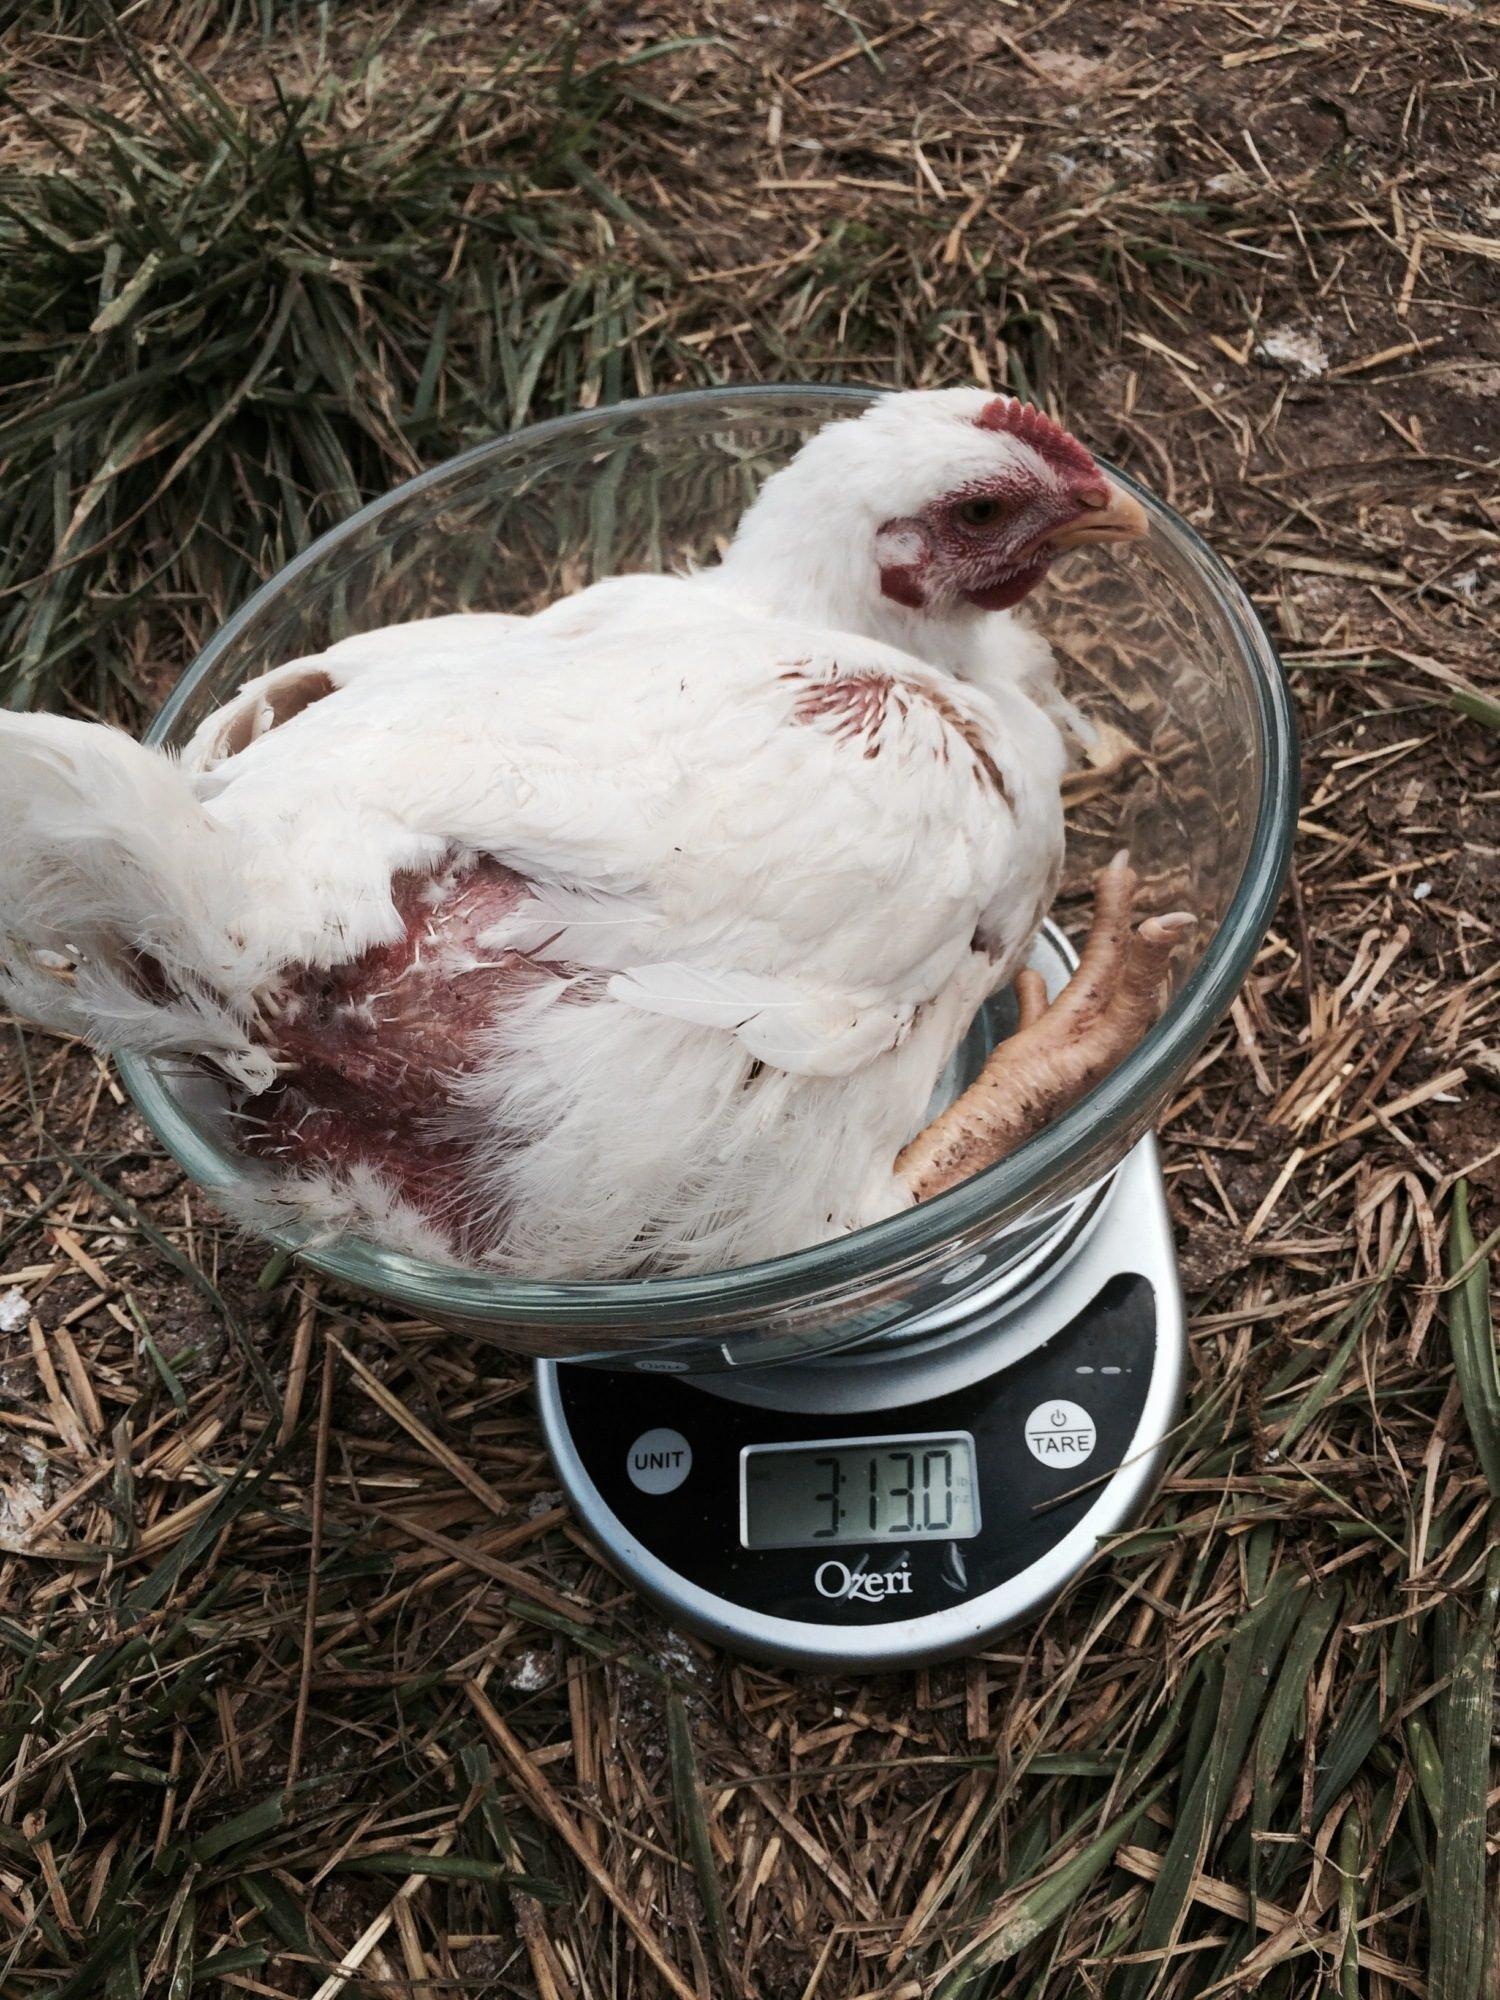 Cornish x journal page 4 backyard chickens img nvjuhfo Image collections